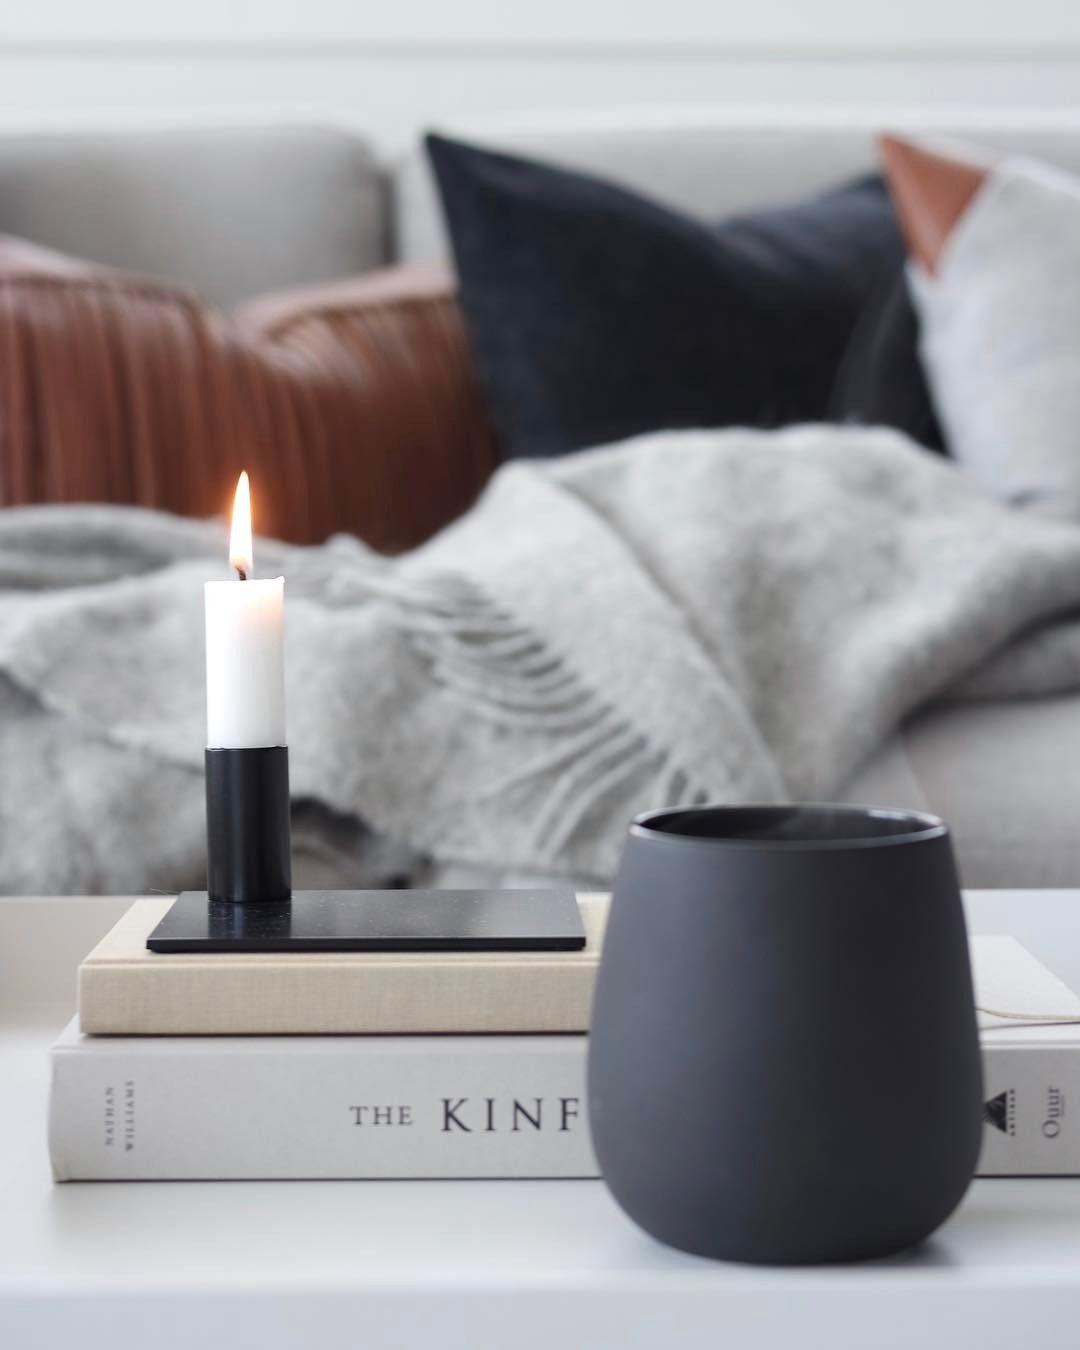 Malling living square candle holder black image by ingvild